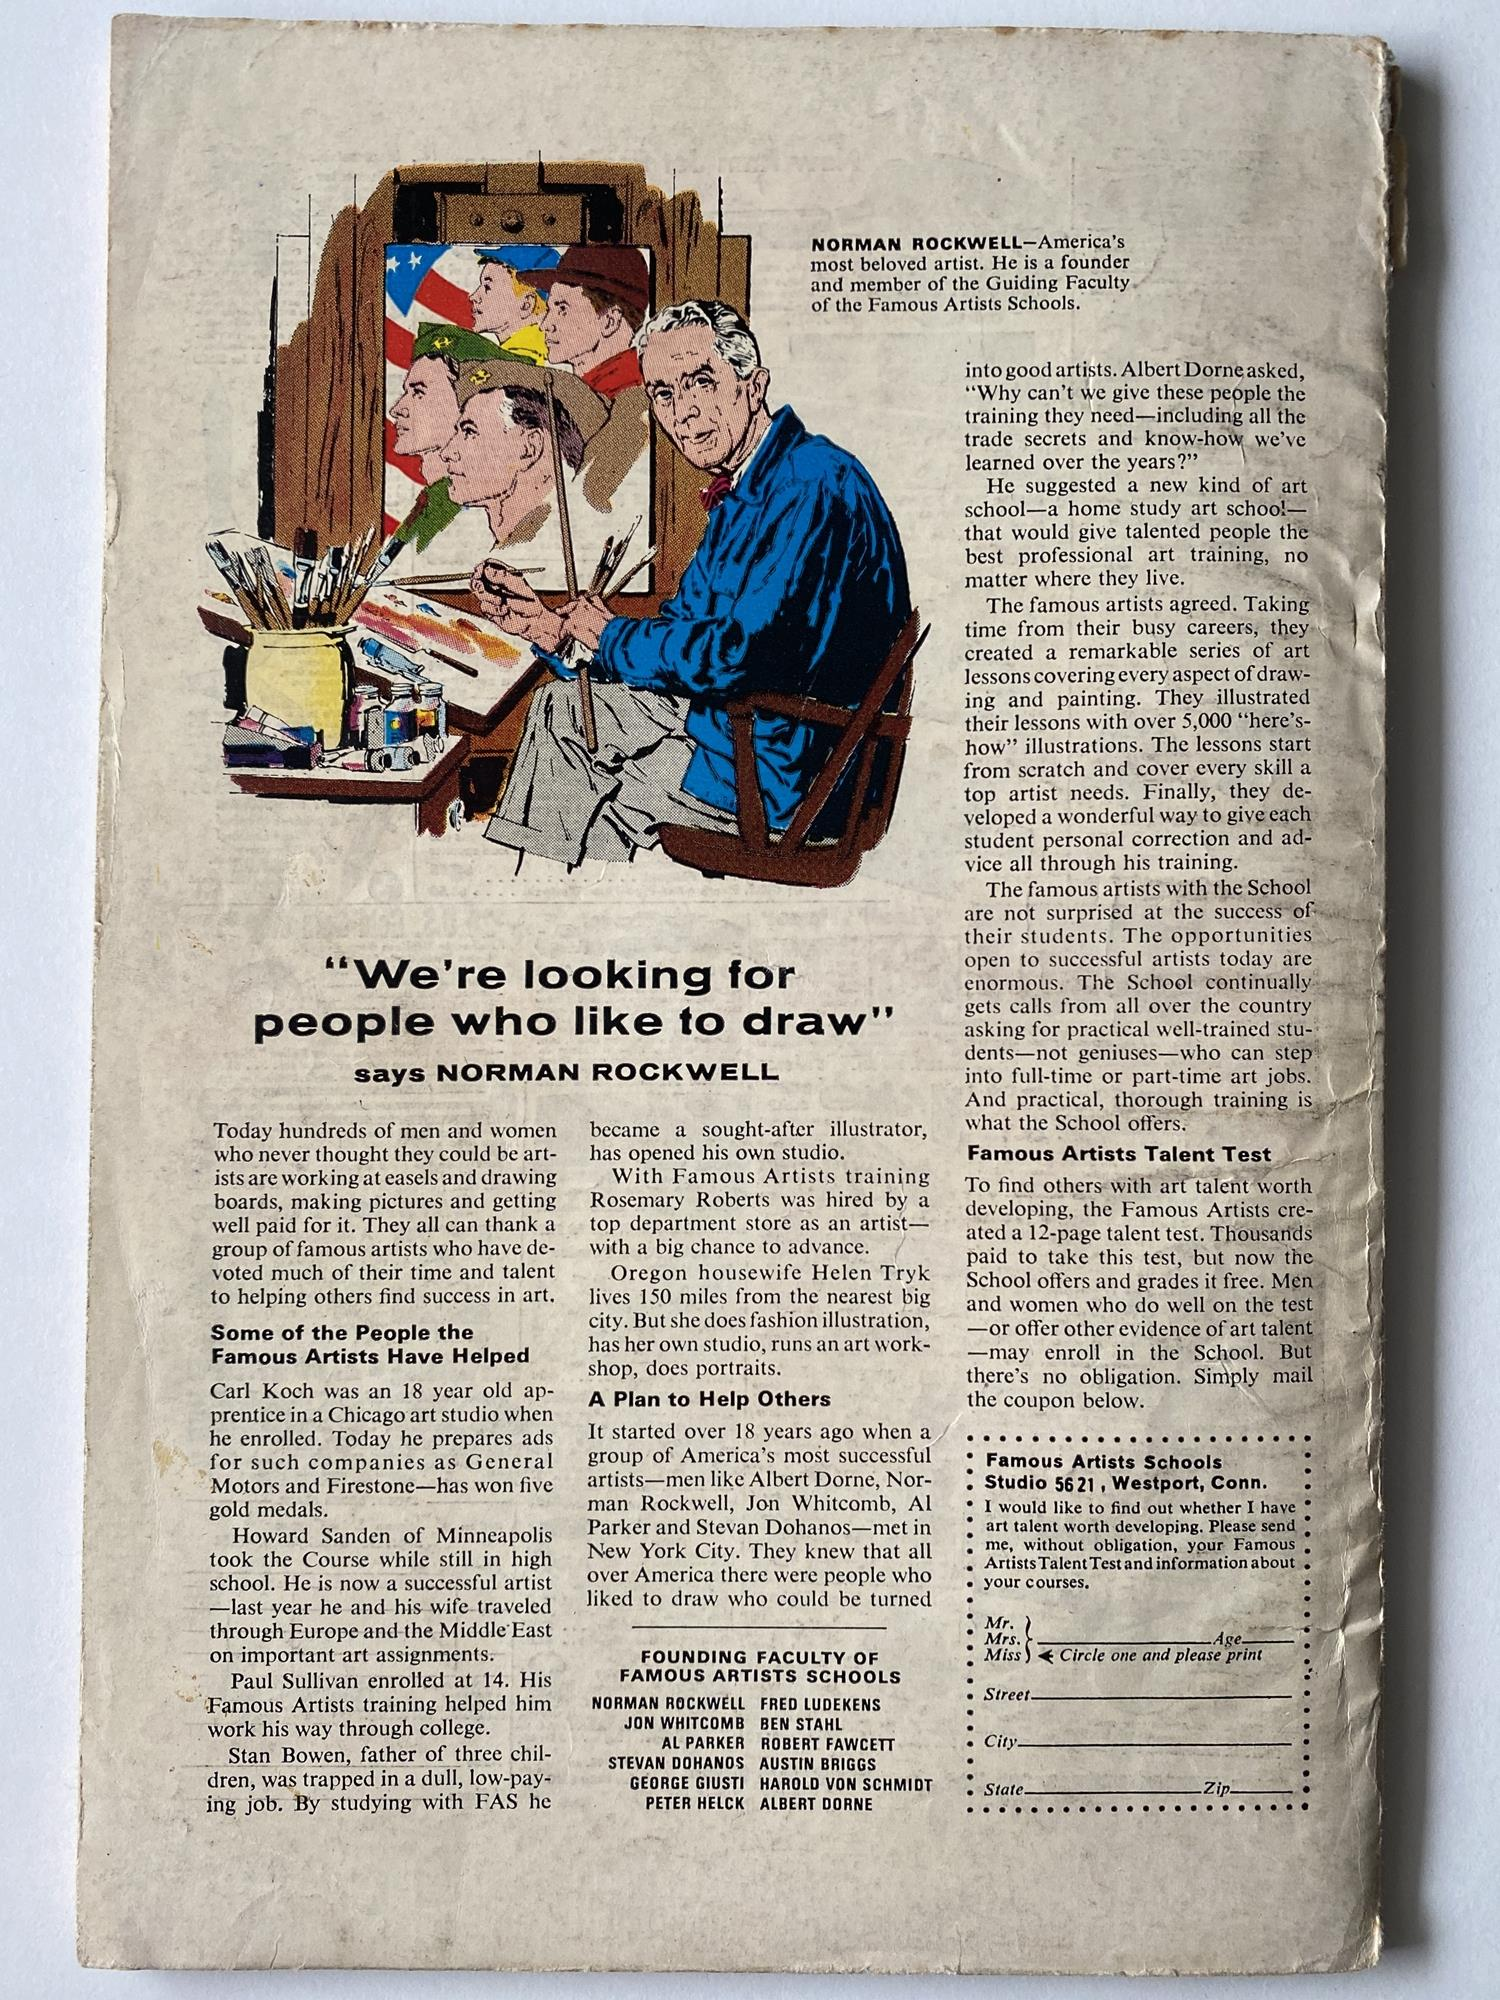 Lot 6 - MARVEL SUPER HEROES: CAPTAIN MARVEL # 12 (1967 - MARVEL - Cents Copy with Pence Stamp) - Origin